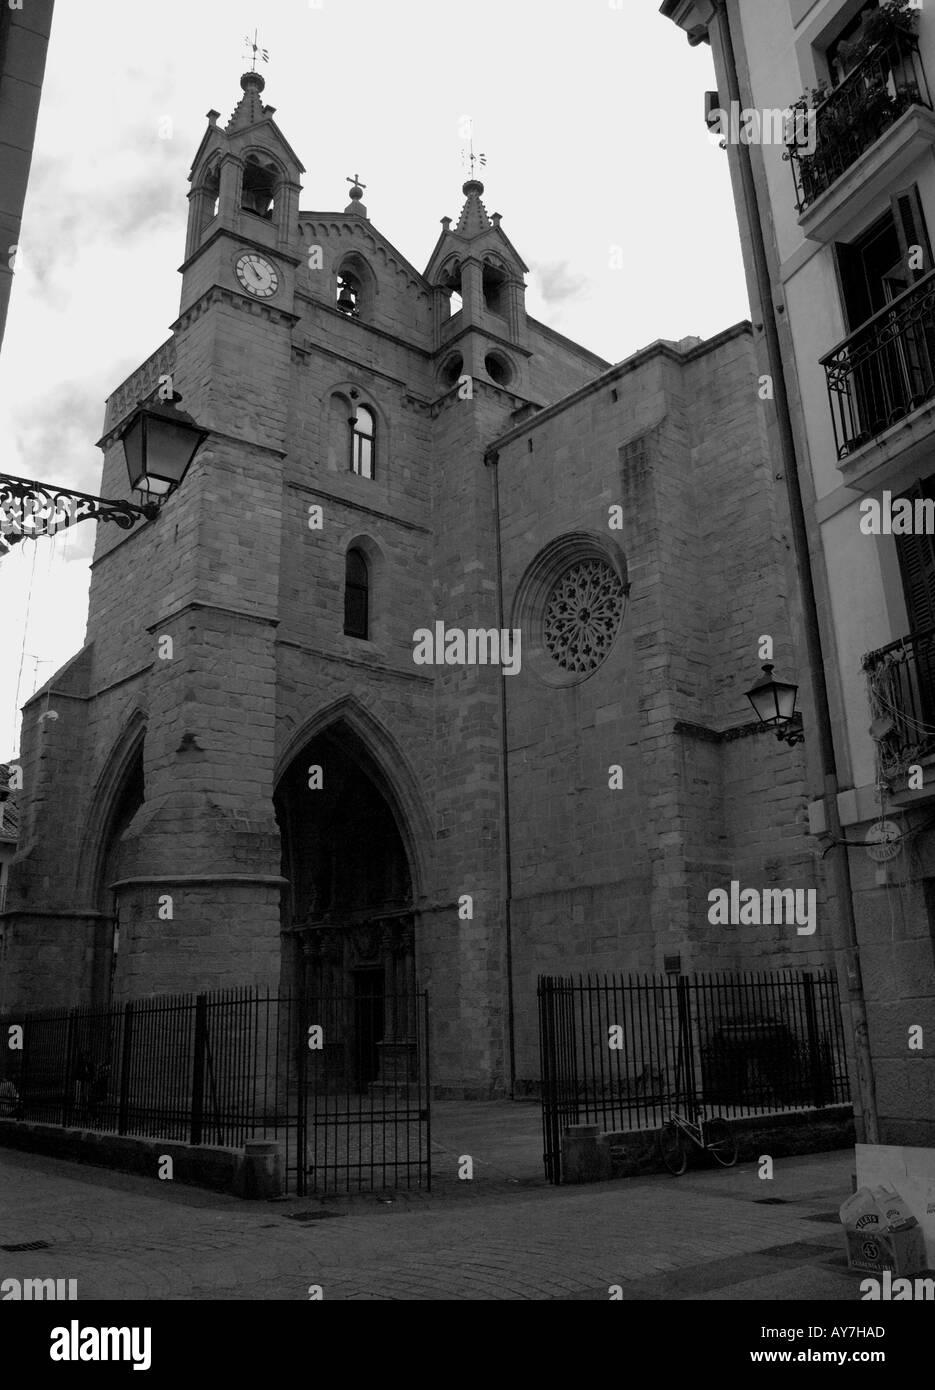 Characteristic Church of Parte Vieja Old Quarter San Sebastian Donostia Basque Country Bay of Biscay Spain España Stock Photo